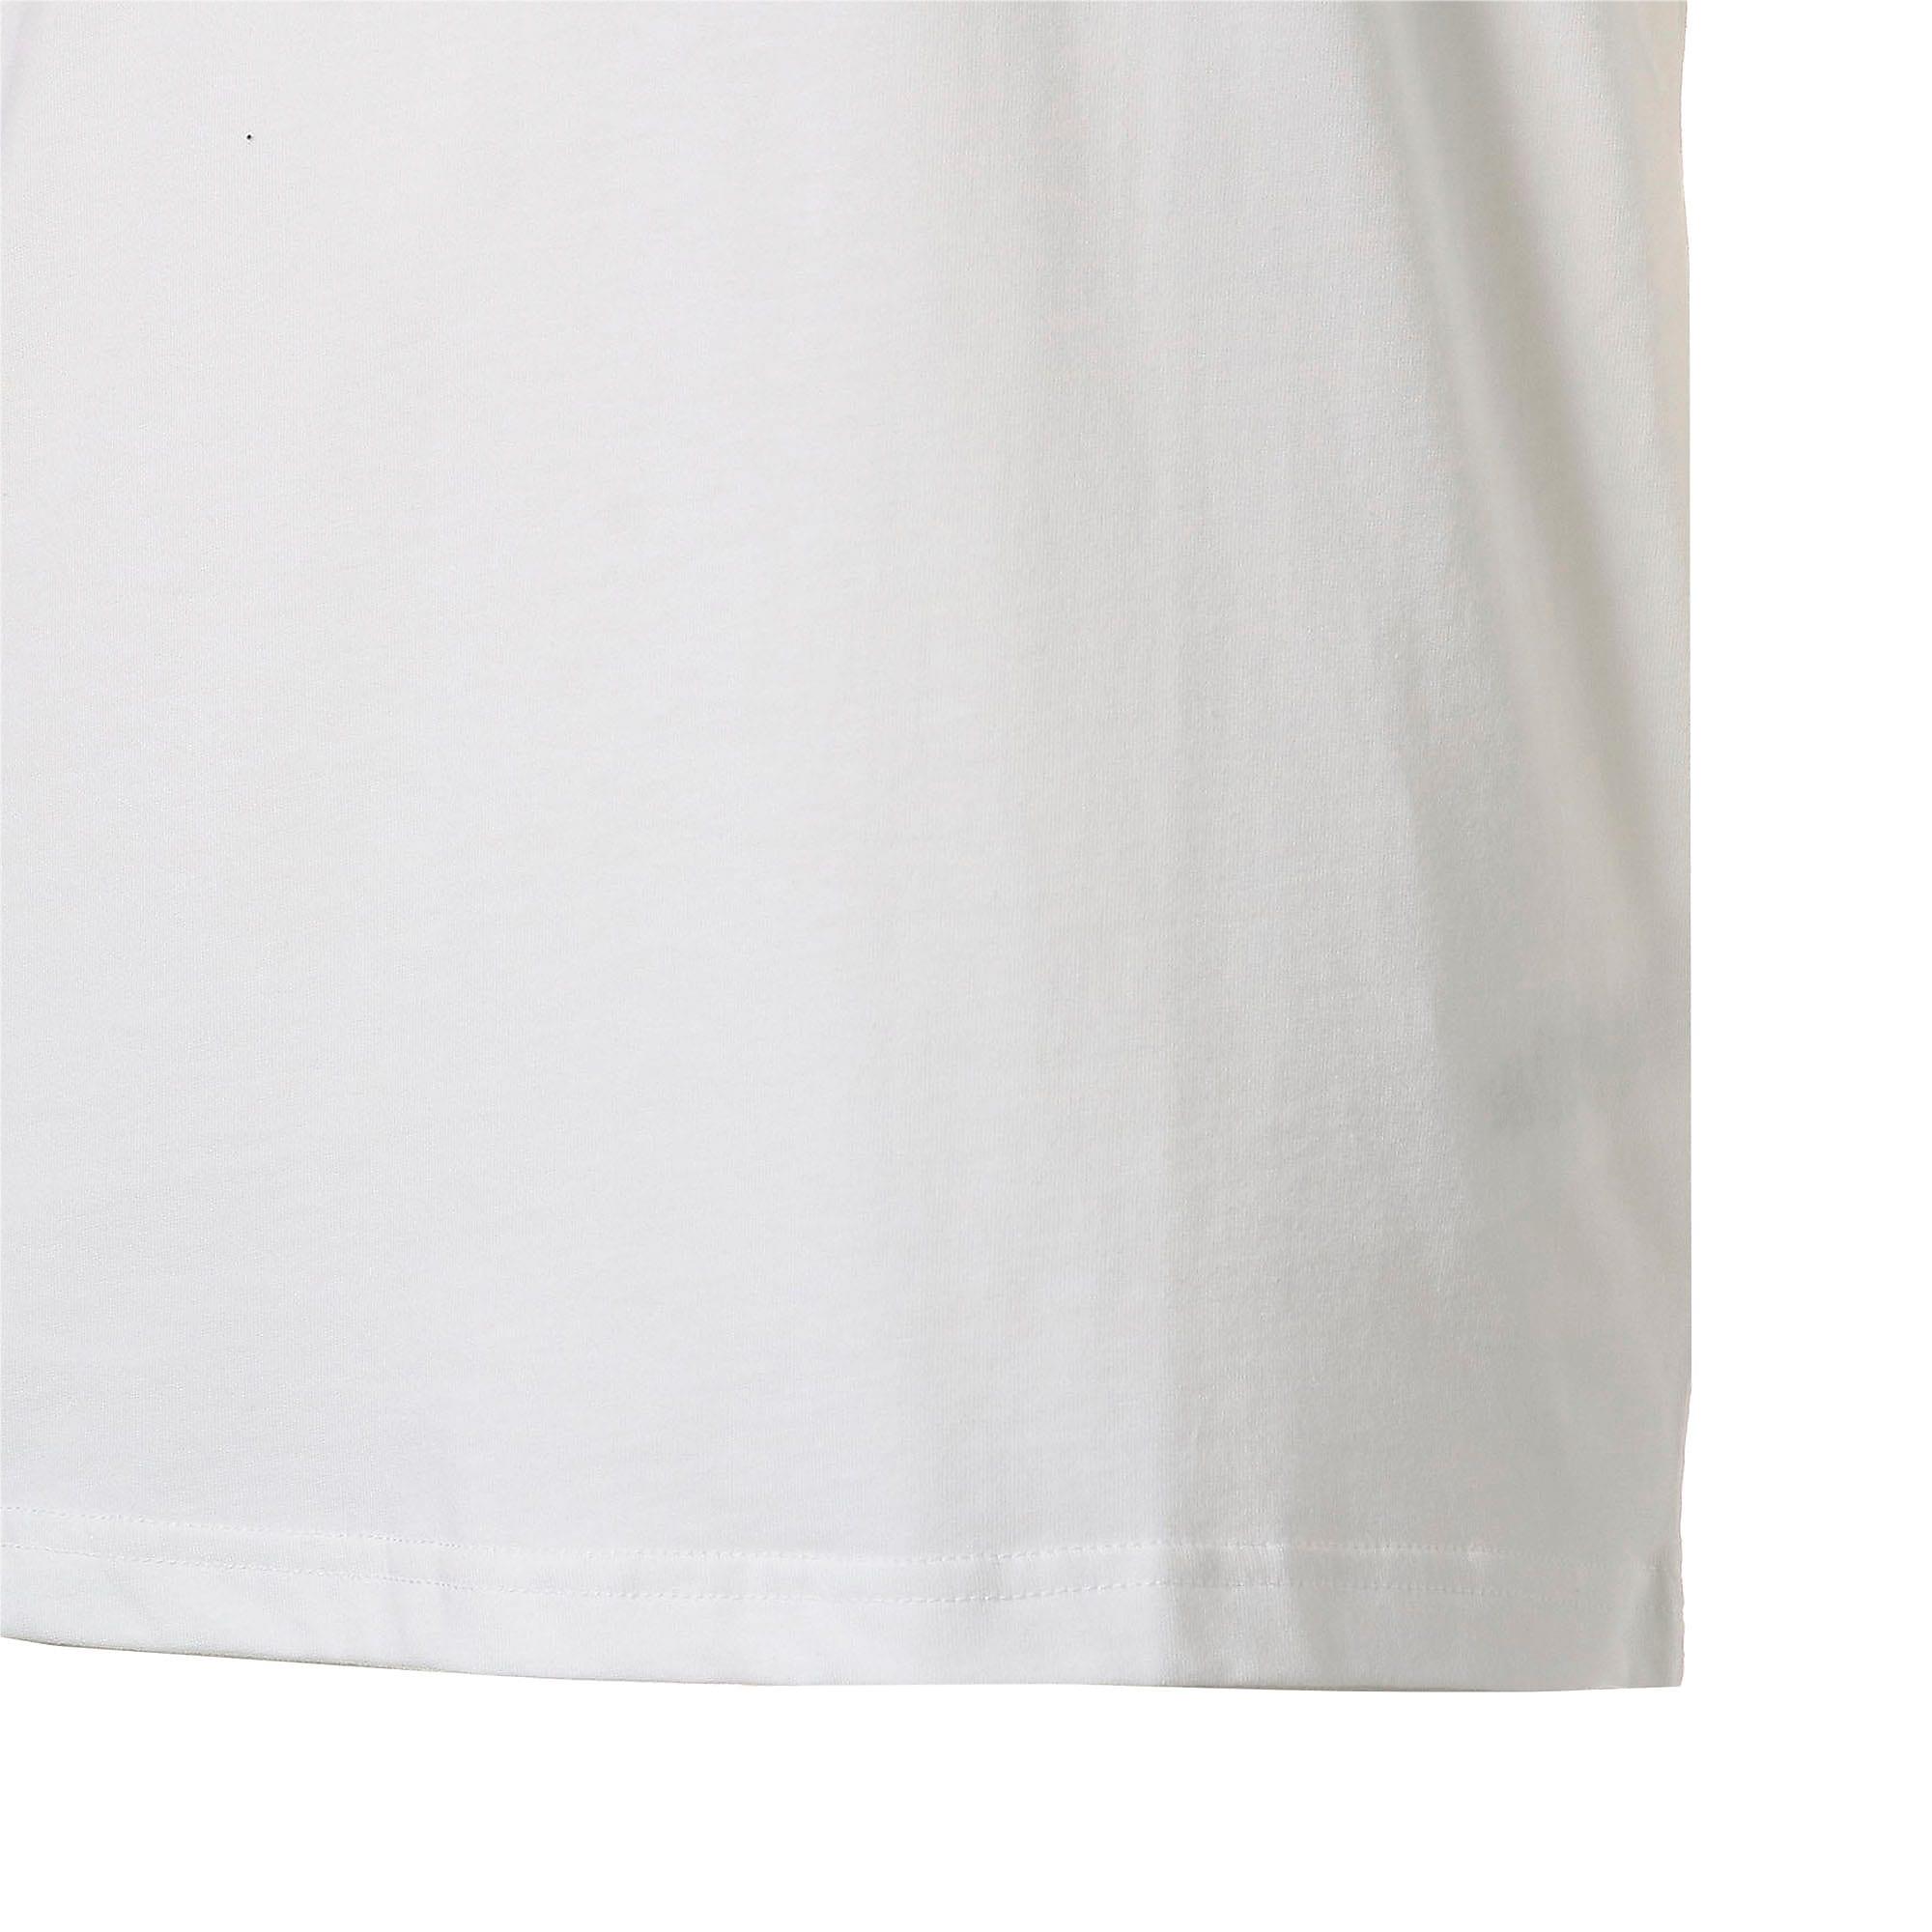 Thumbnail 9 of PUMA x LES BENJAMINS Tシャツ, Puma White, medium-JPN